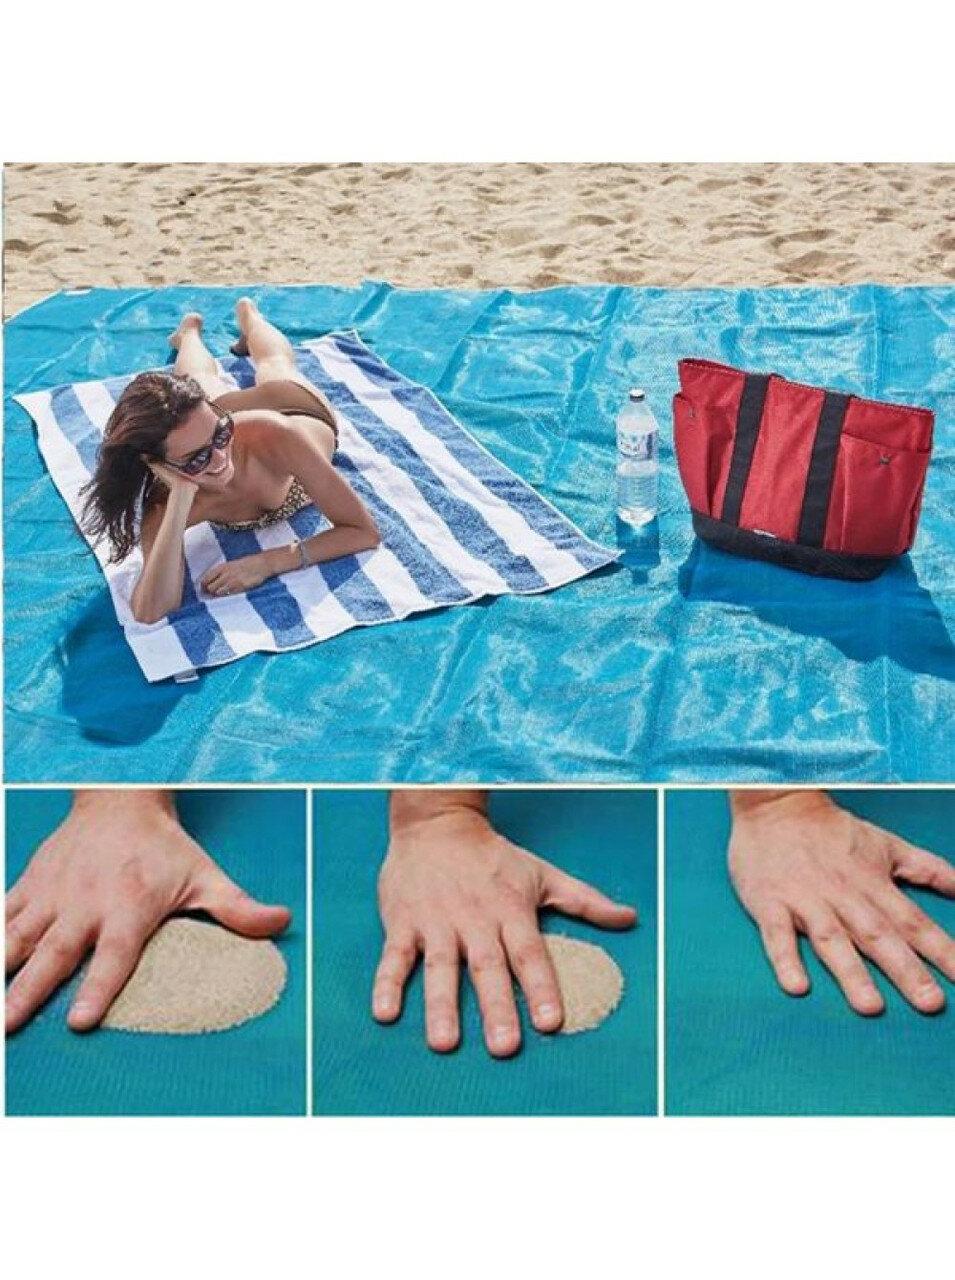 Пляжная подстилка ClapSand анти-песок в Невеле